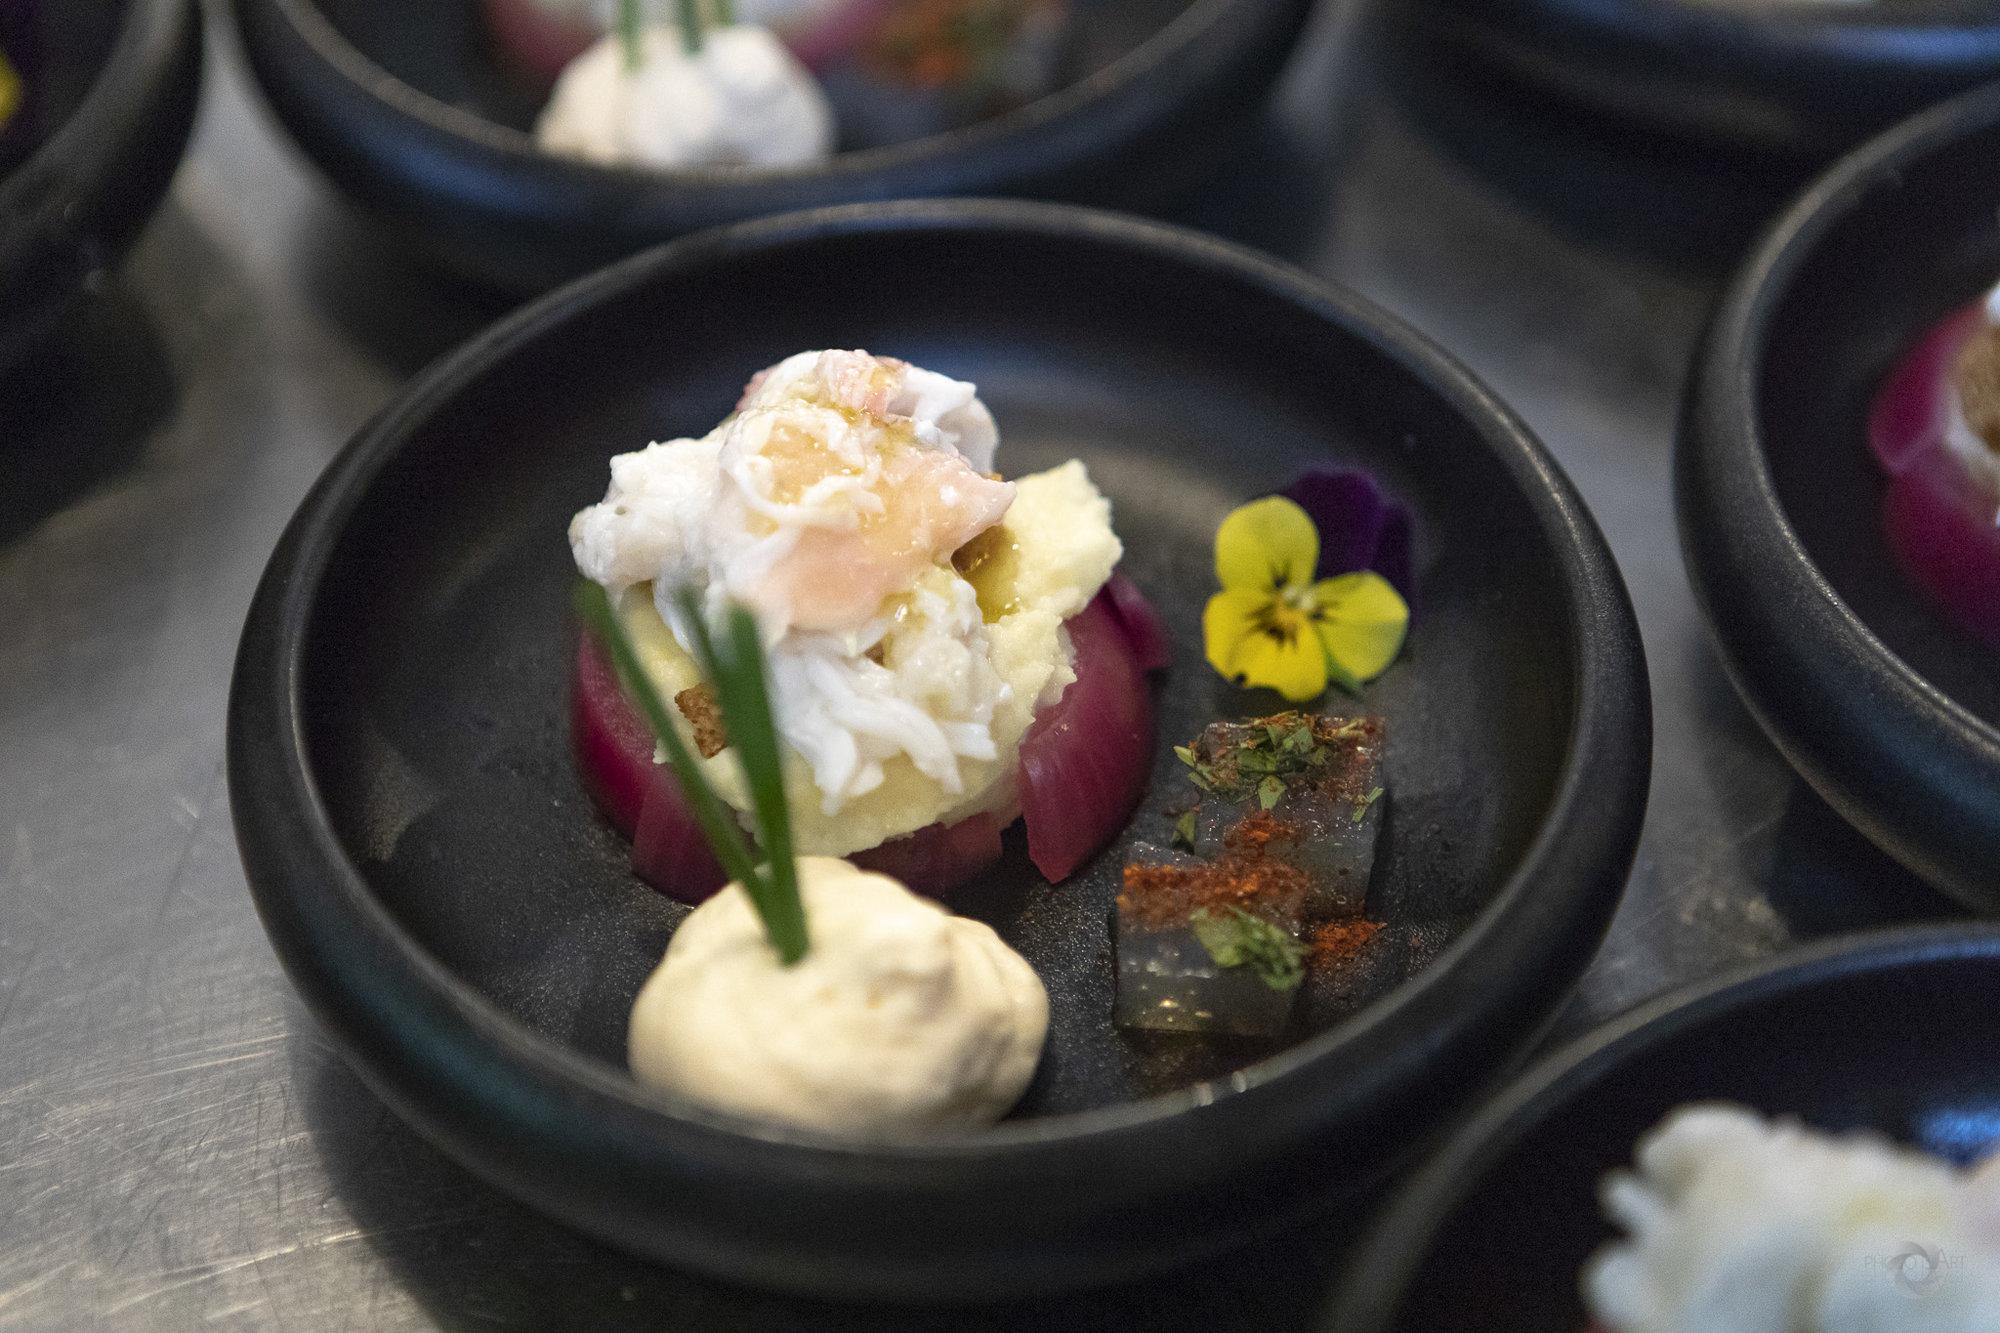 02-2018-08-18 OT SG Food.jpg